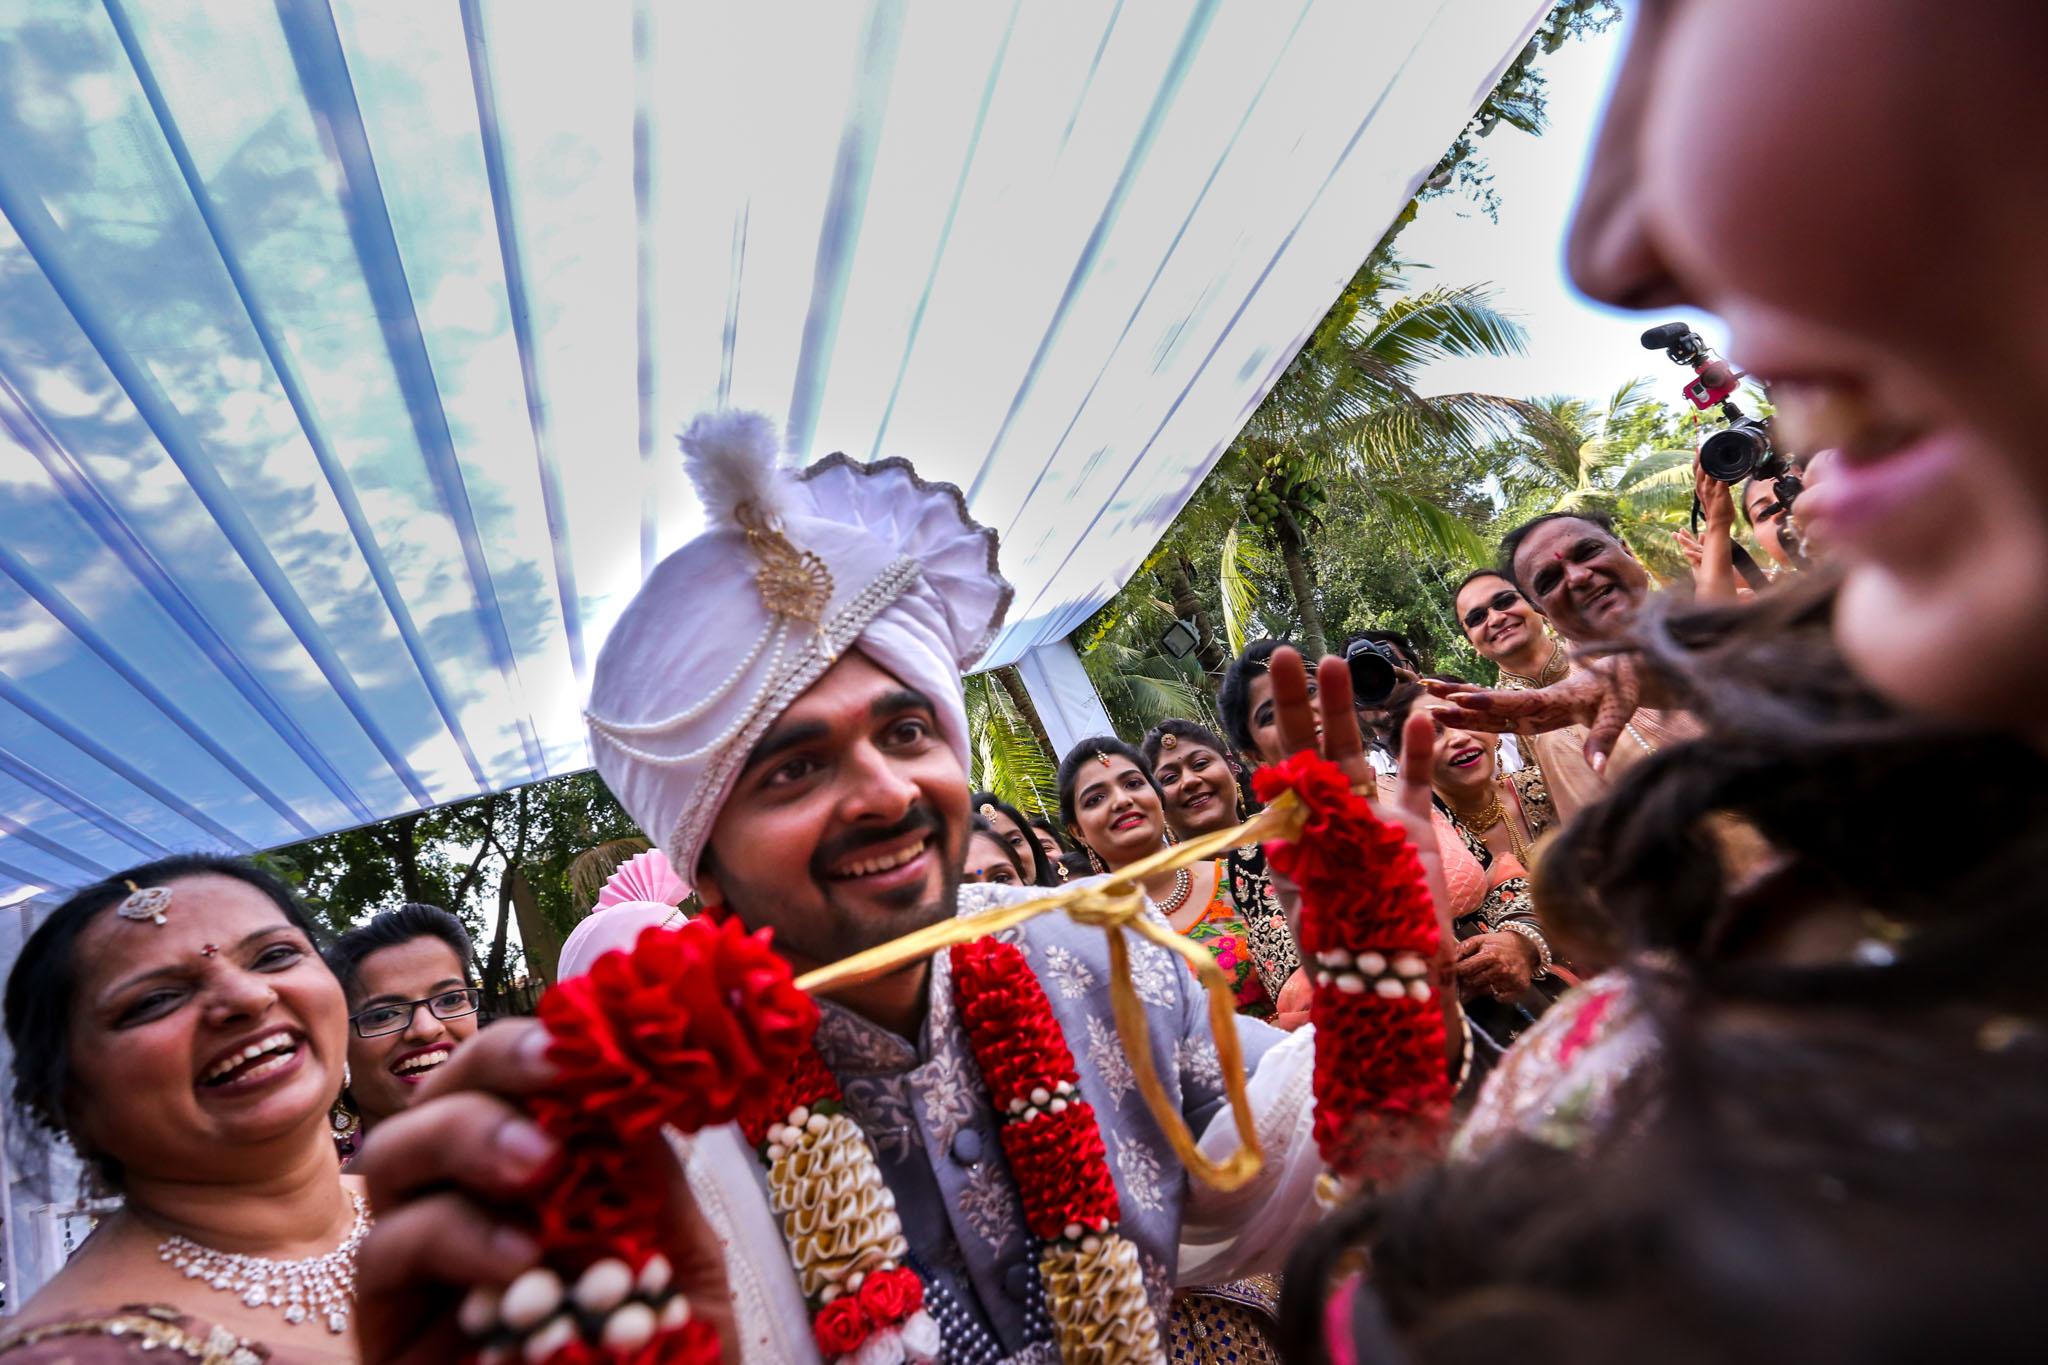 Mukti x Ojas Wedding Akshjay Sansare Photography Best wedding photographer in mumbai India Candid Cinematic Films videos-37.jpg